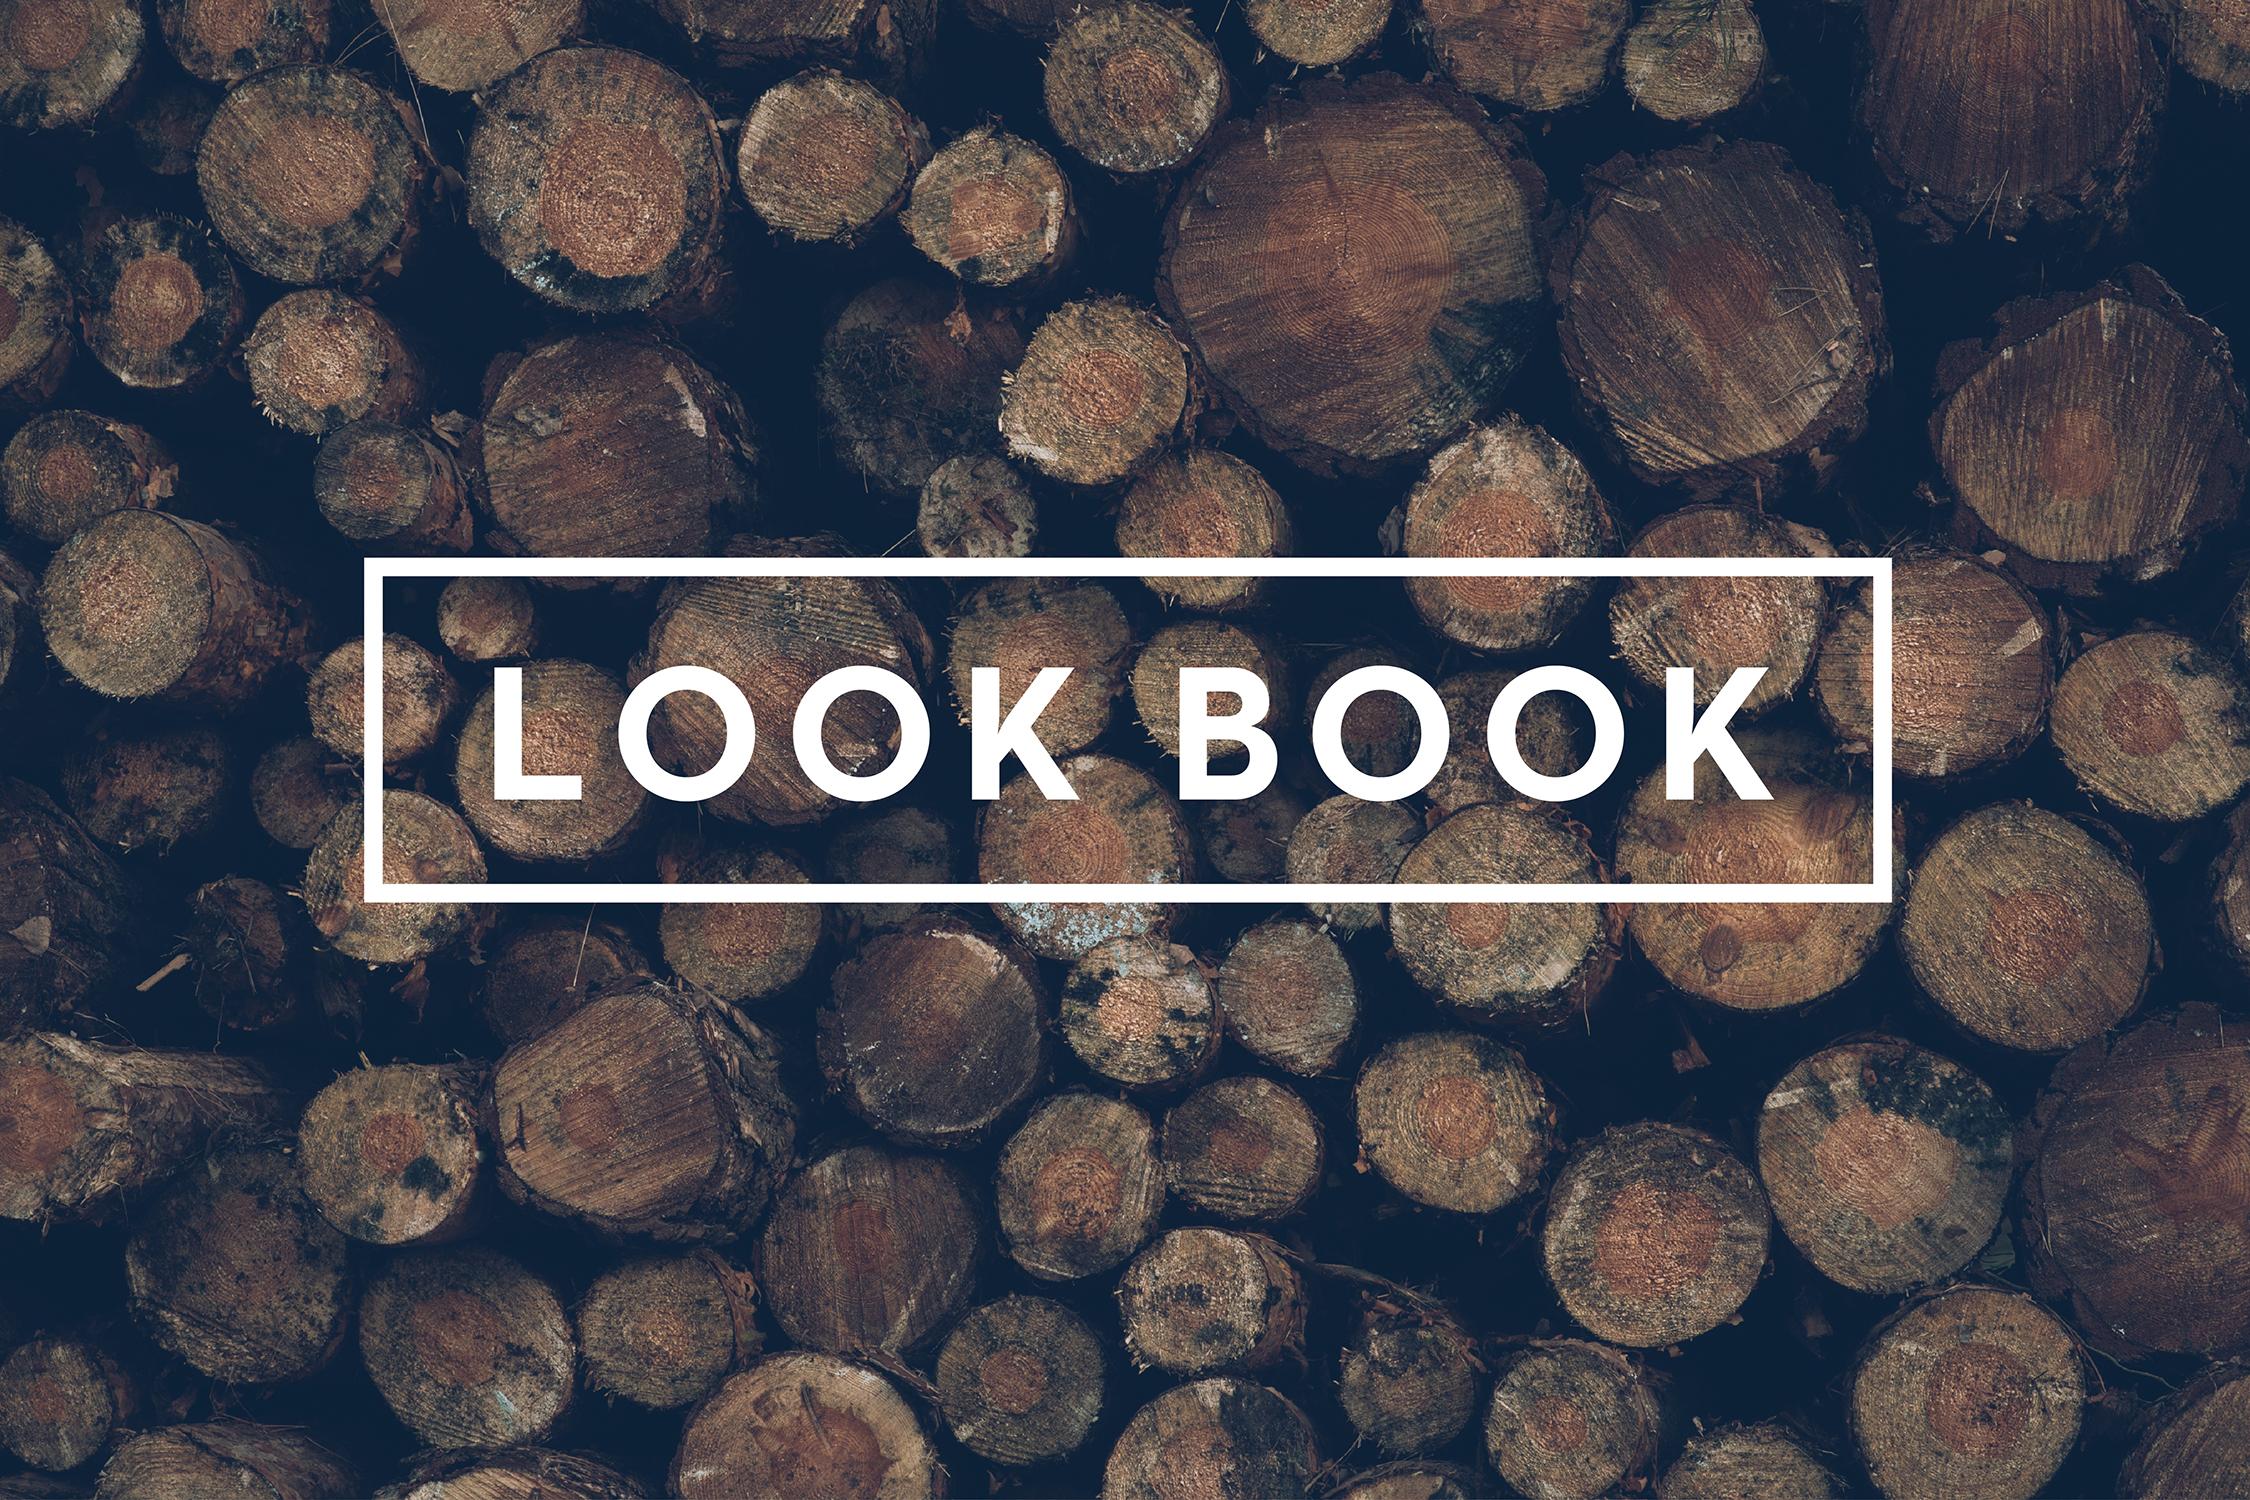 Lookbook_new-01.jpg